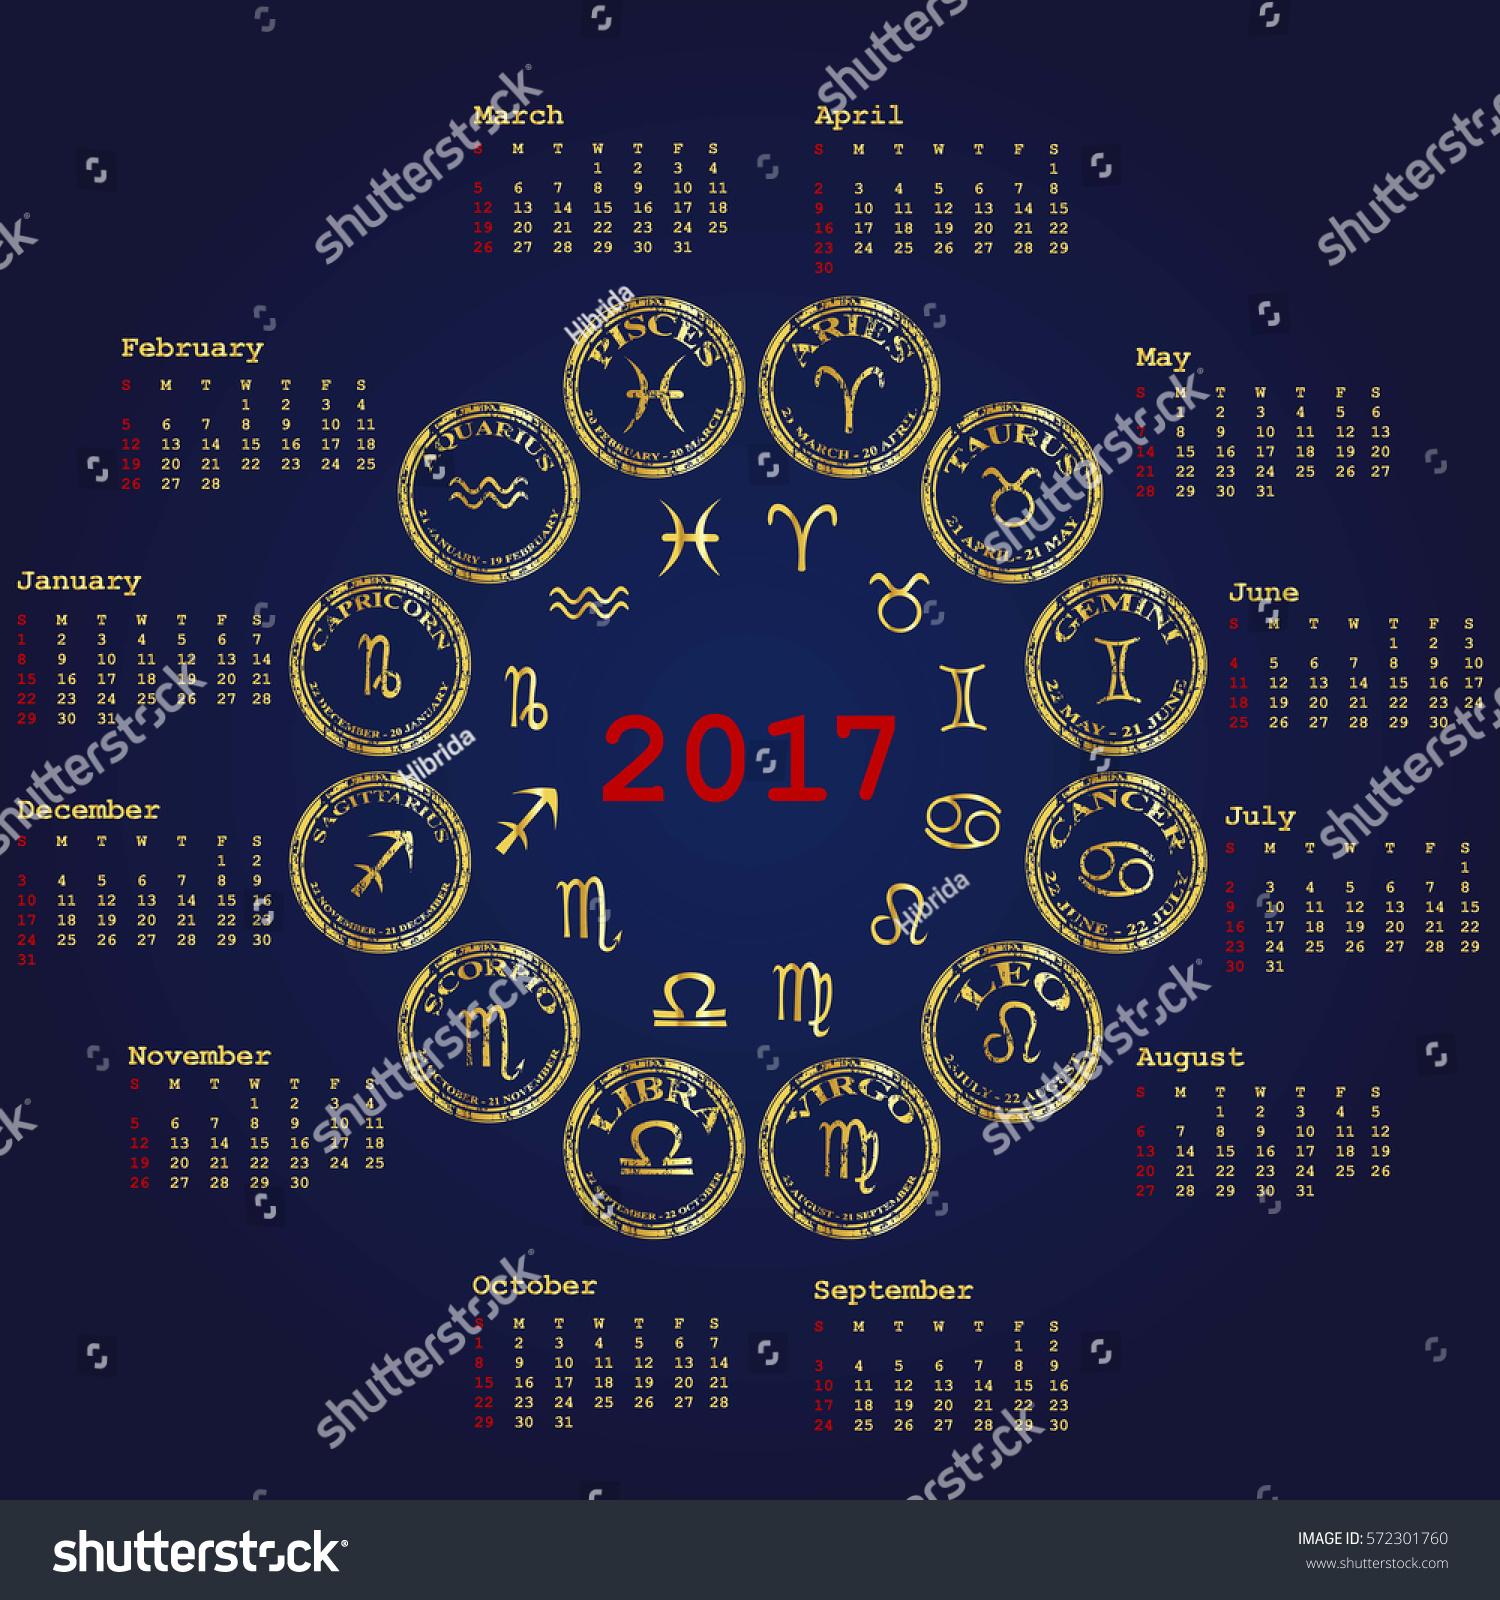 Calendar Design Zodiac : Calendar zodiac signs stock illustration